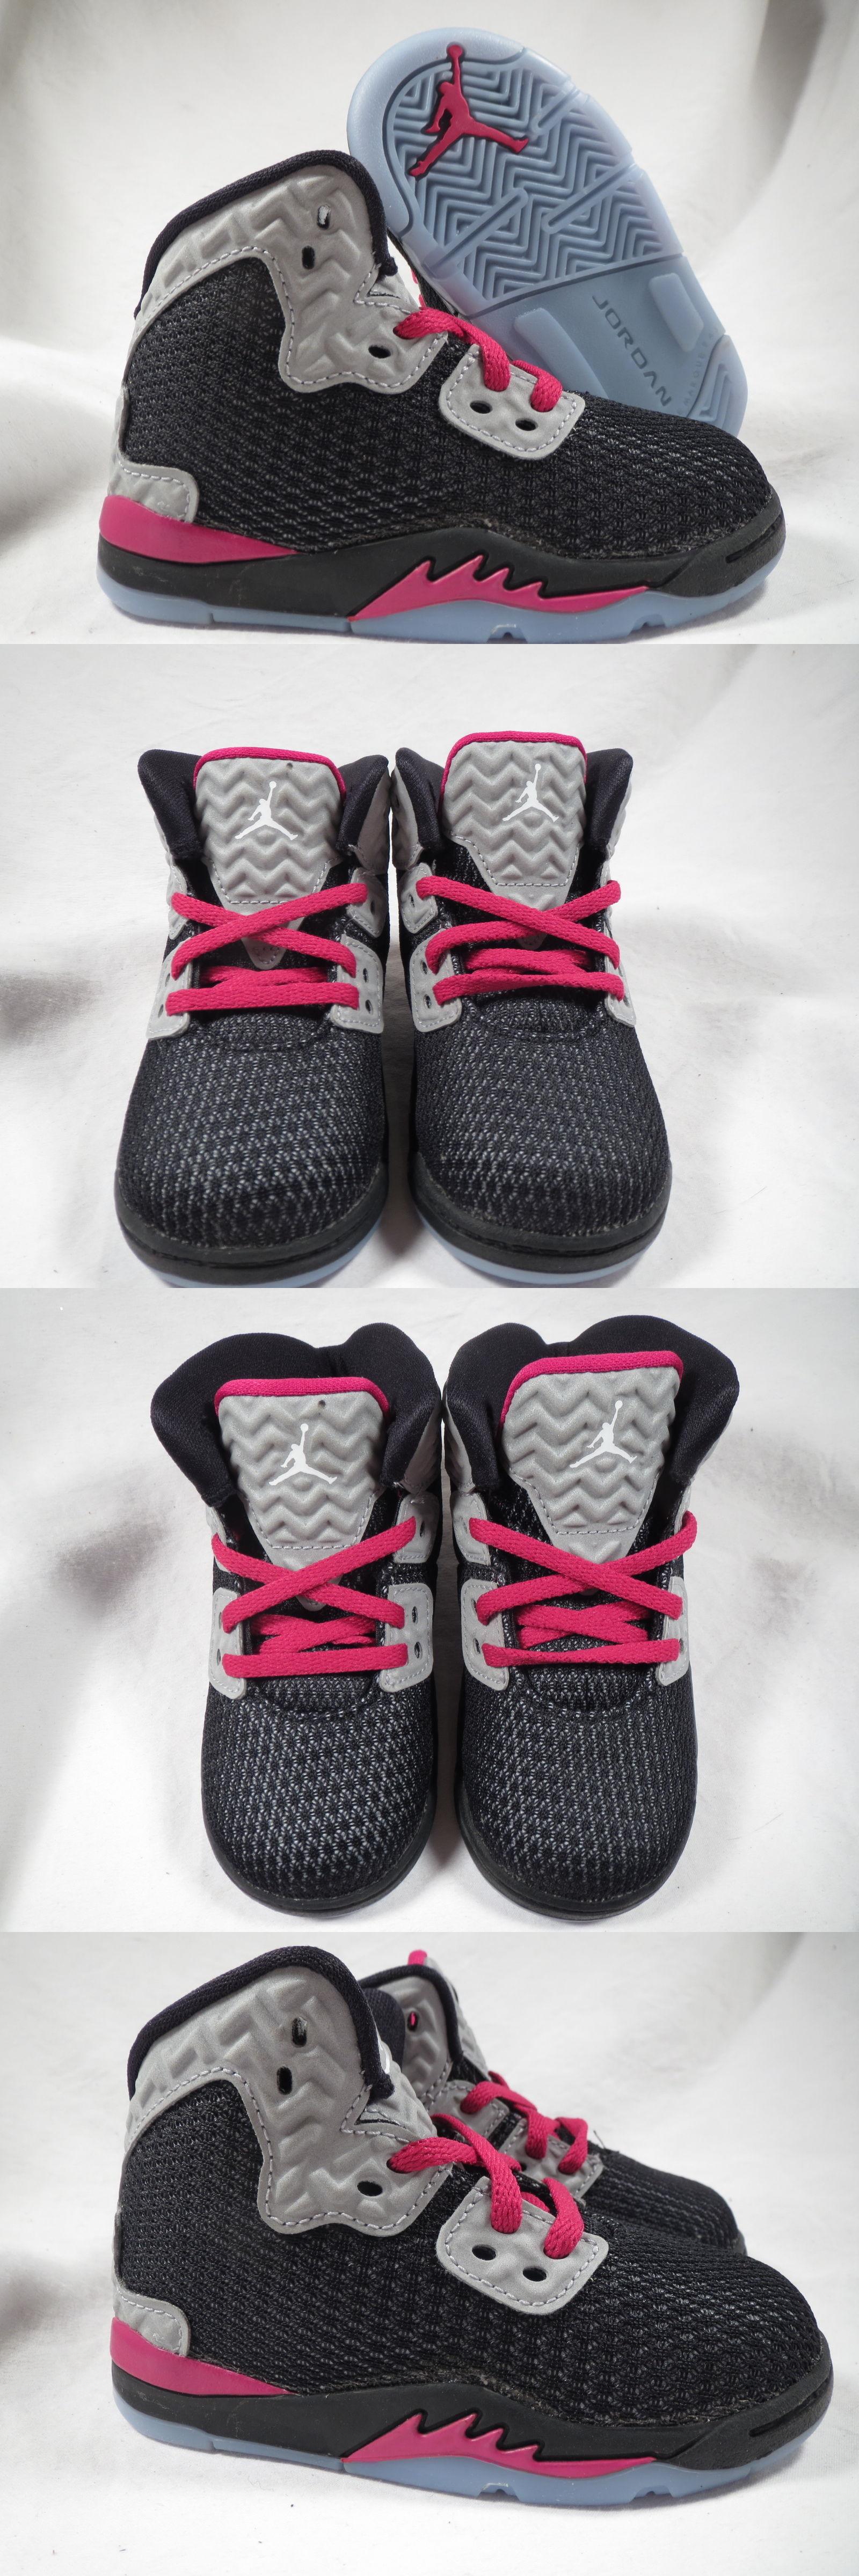 Baby Shoes 147285: Nike Jordan Spike Forty Gt Toddler Boys Girls Leather  Black Fuchia Shoes